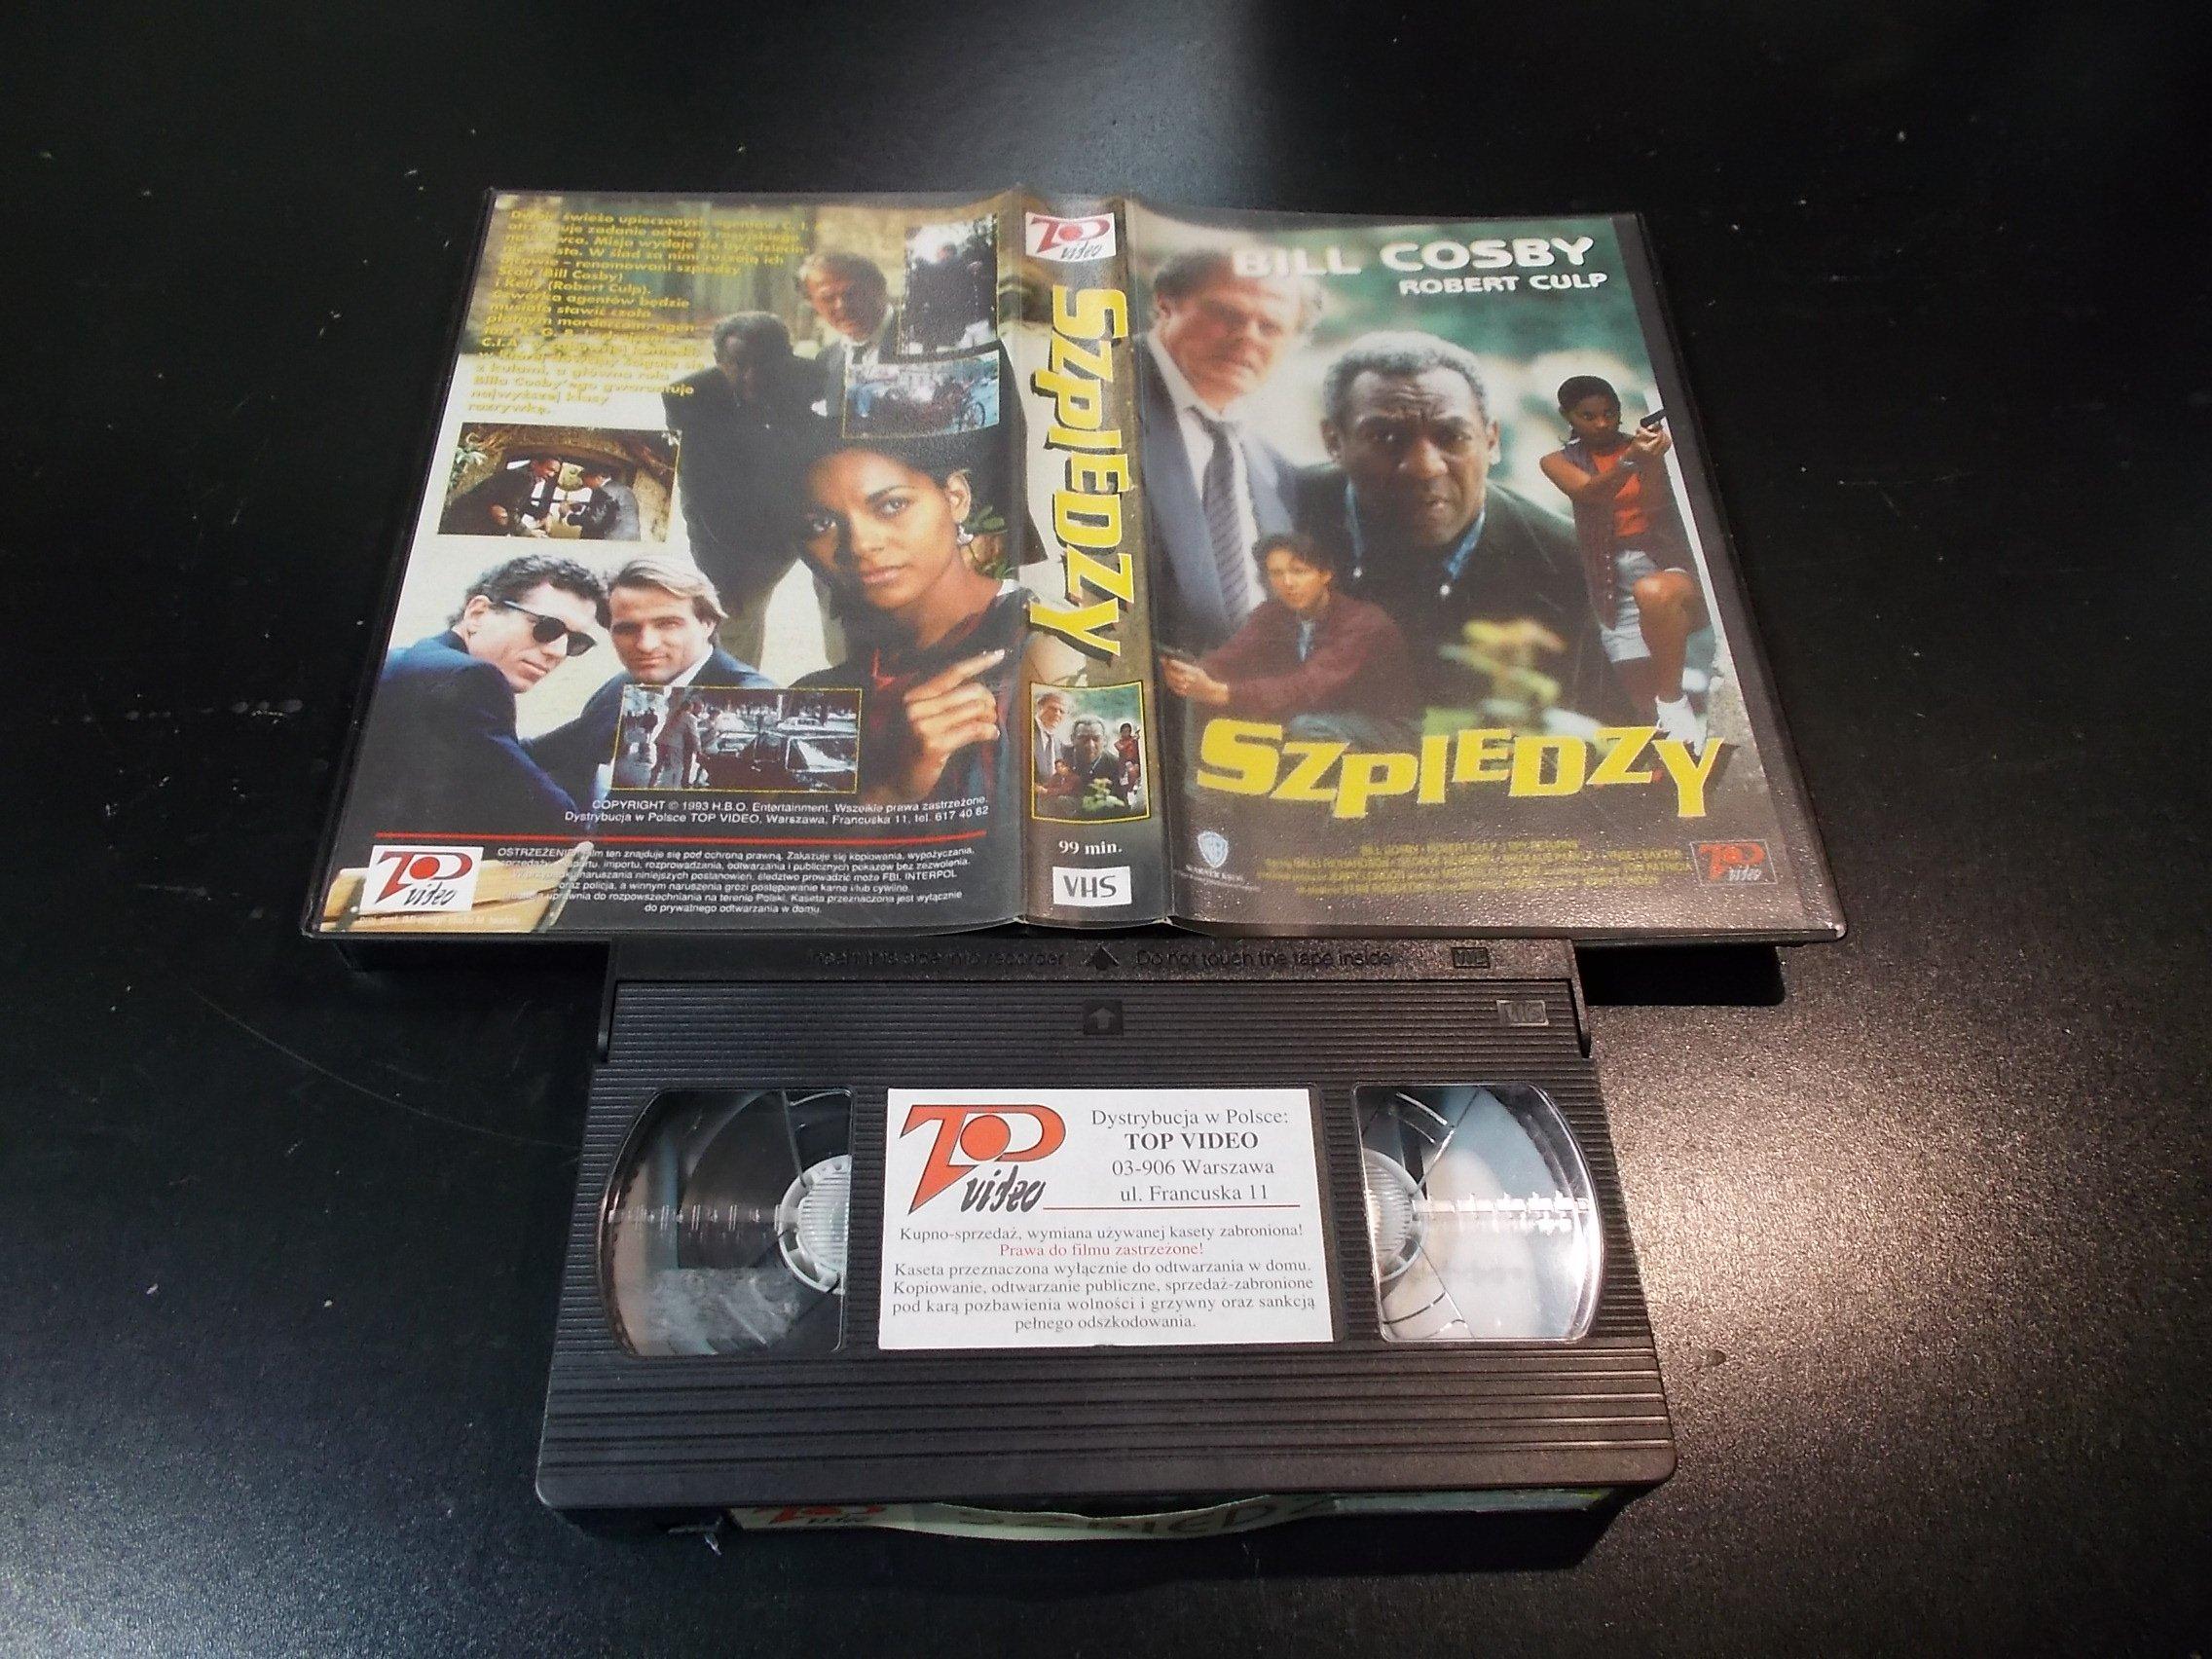 SZPIEDZY - kaseta Video VHS - 1403 Sklep